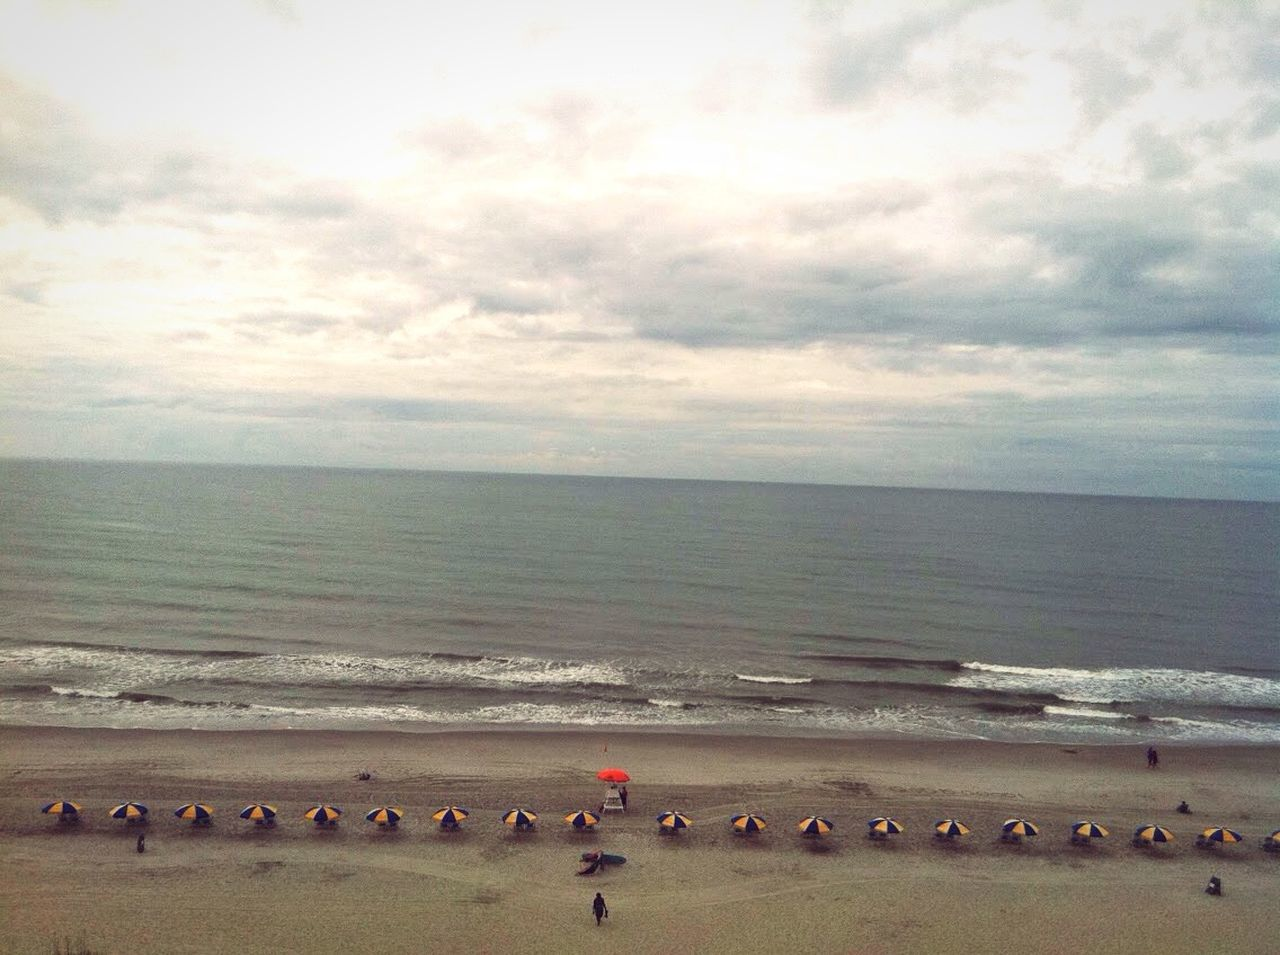 Umbrella Beach Ocean Waves Calm Water Sand Morning Blue Yellow Beachphotography Beach Photography Beach Life Beach View Ocean View Ocean Photography Oceanside Oceanview Ocean Waves Nature Photography Nature_collection Outdoorphotography Naturelovers Beauty In Nature Natural Beauty